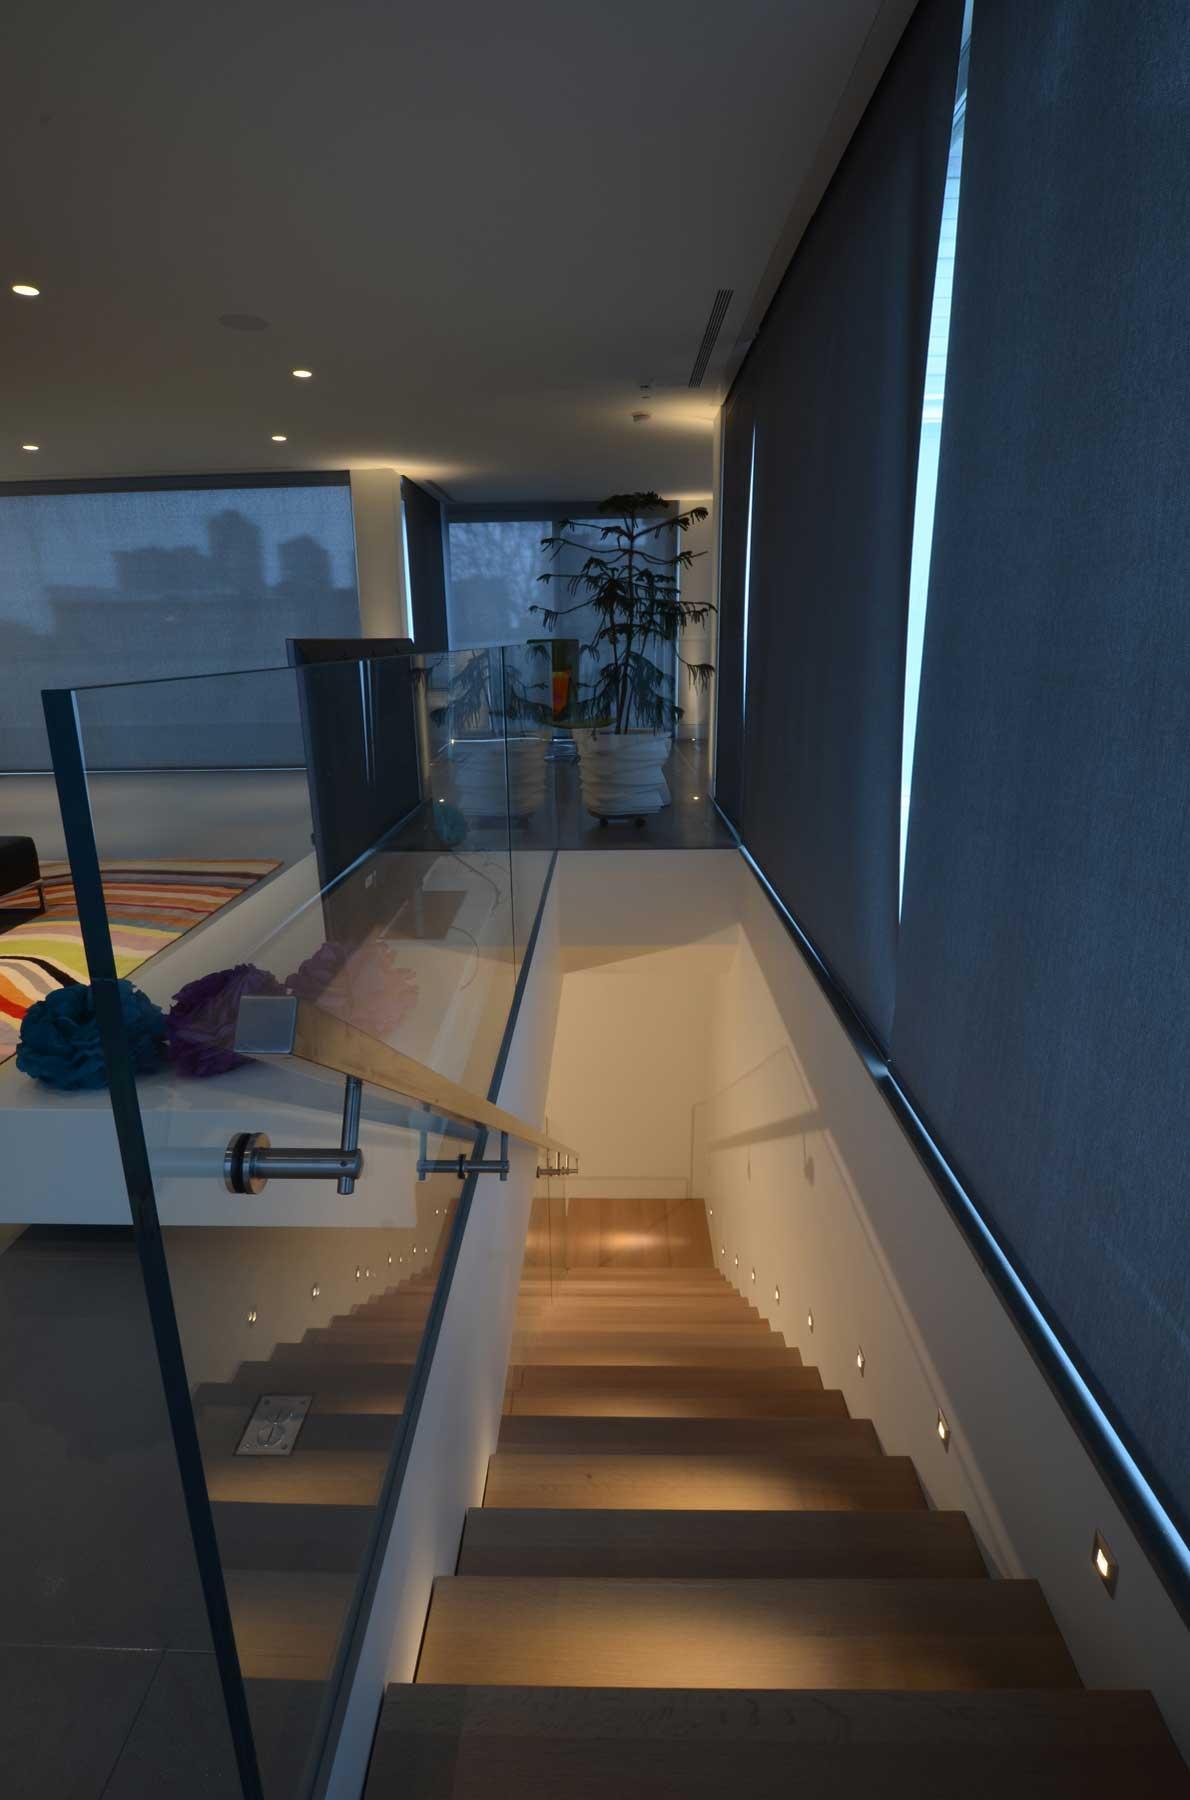 Installation Gallery Stairway Lighting